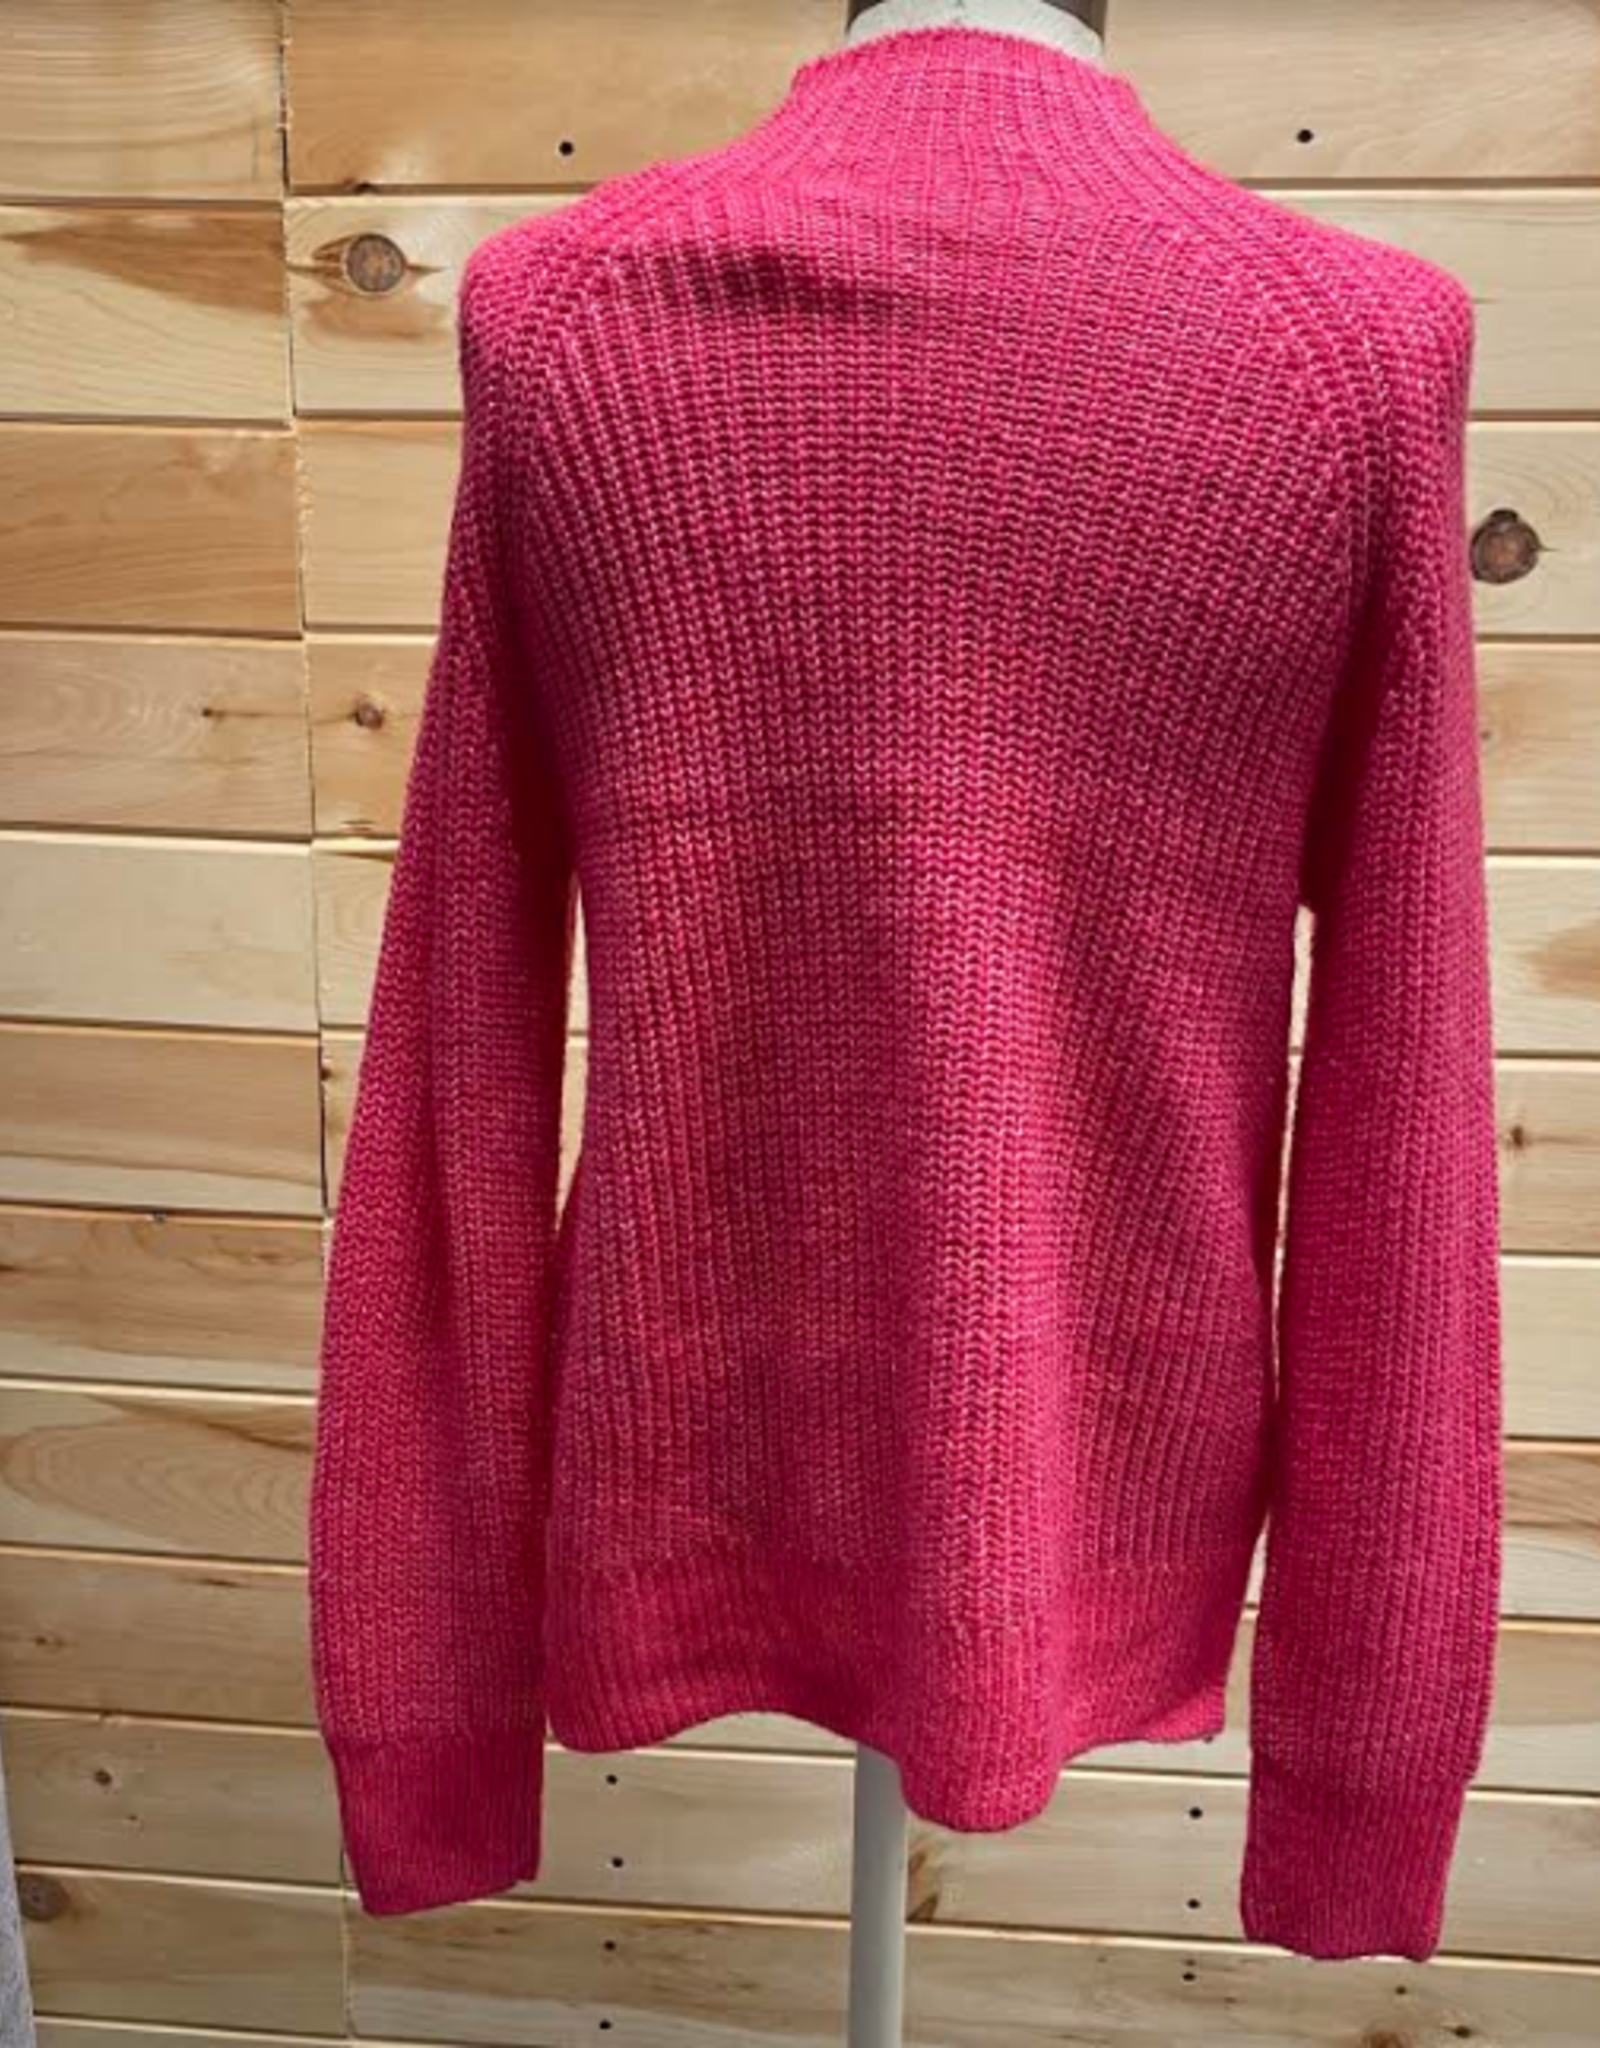 MICHAEL KORS Michael Kors Pink Turtle Neck Sweater Size Sm